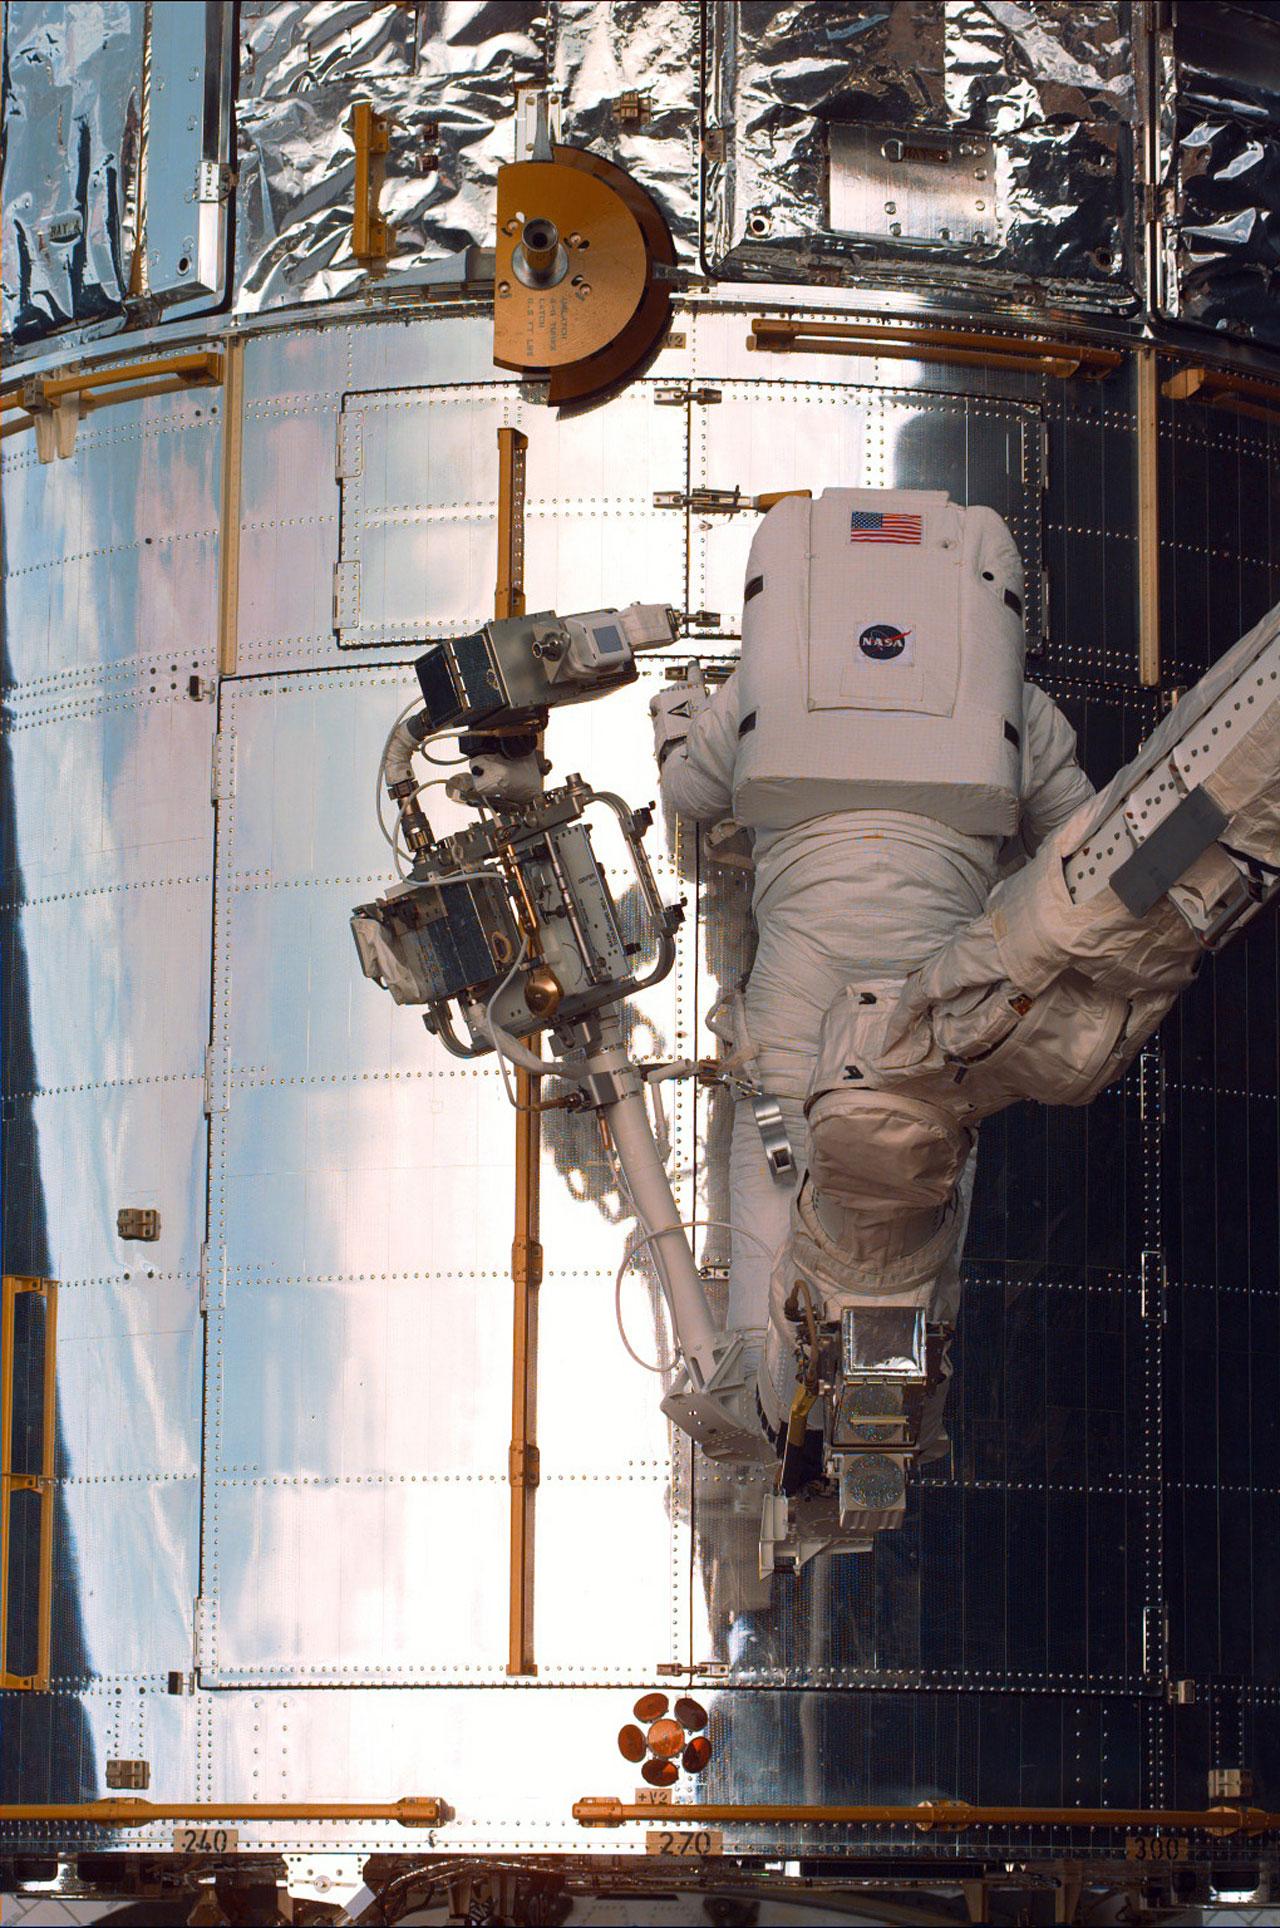 SM2: Astronaut opening Aft Shroud